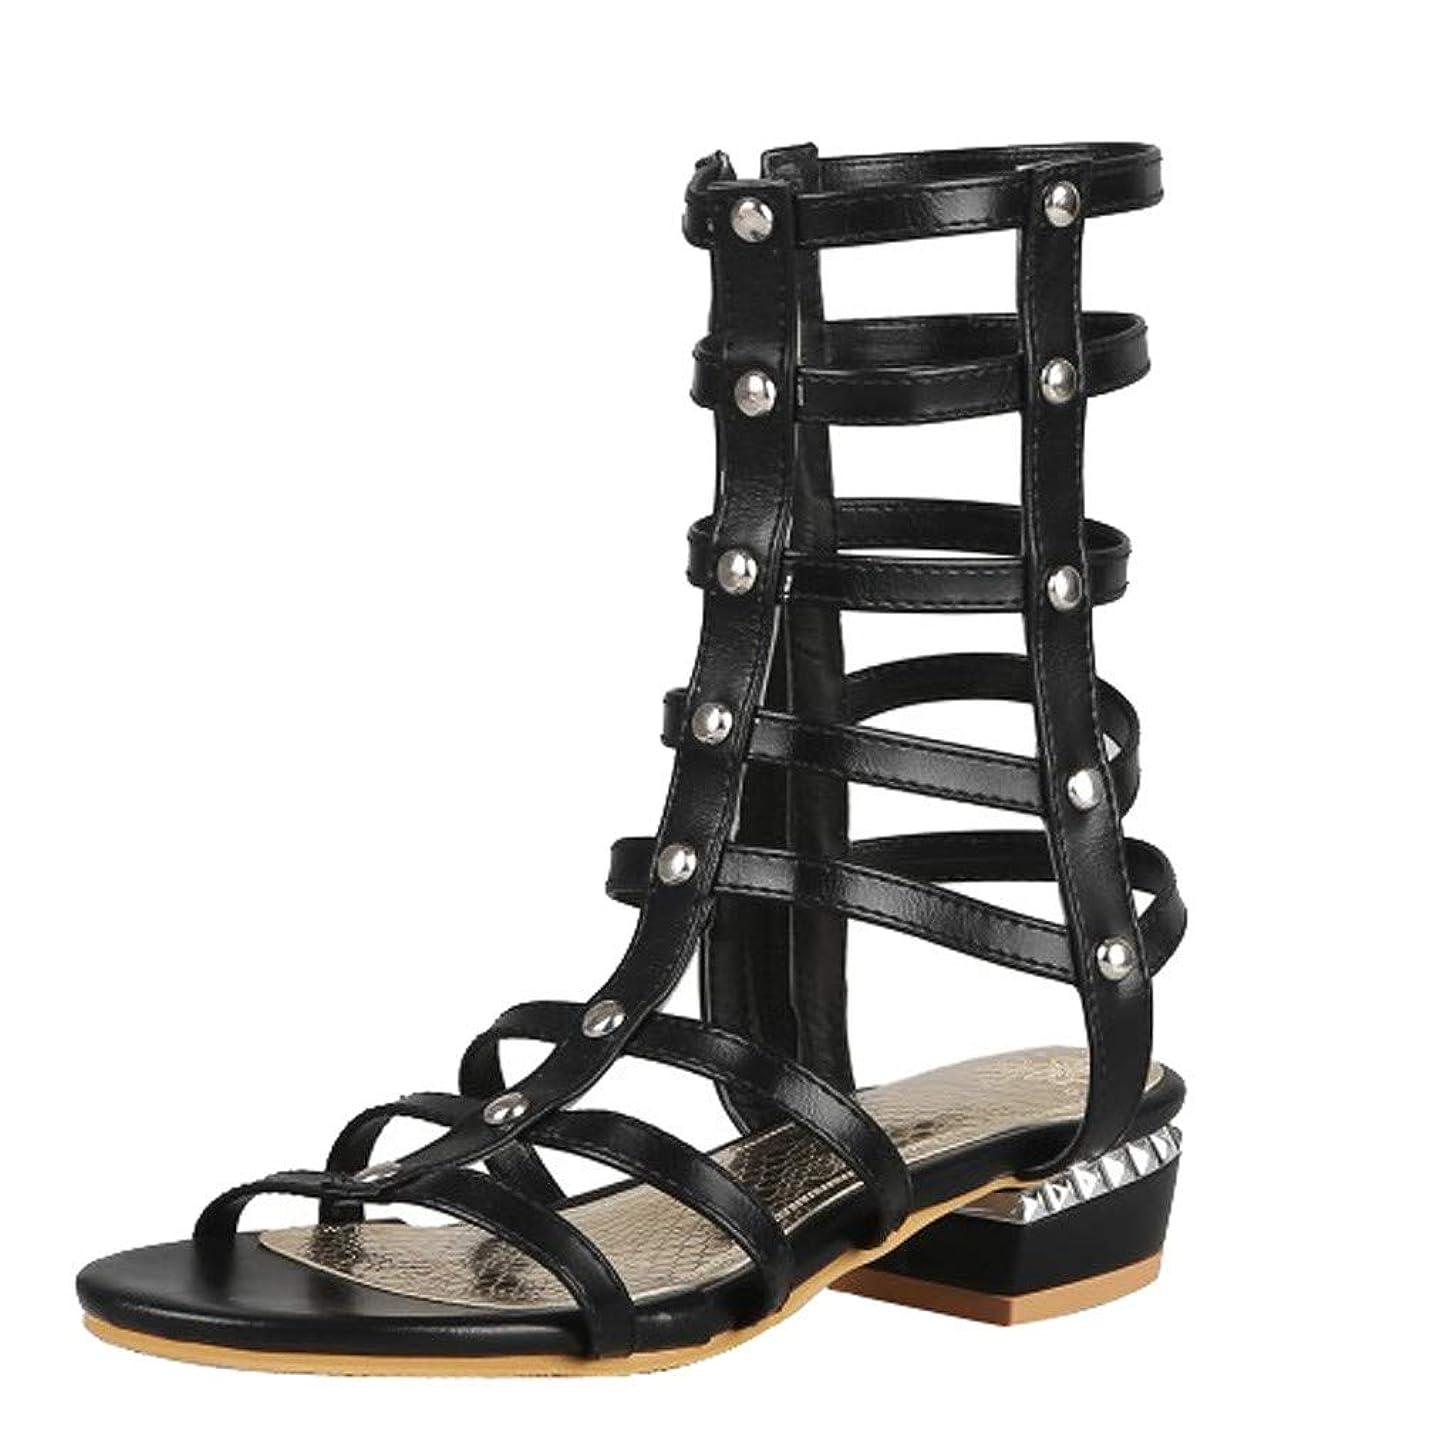 Women's Fashion Open Toe Studded Strappy Buckle Stylish Beach Flat Boots Gladiator Sandals JHKUNO